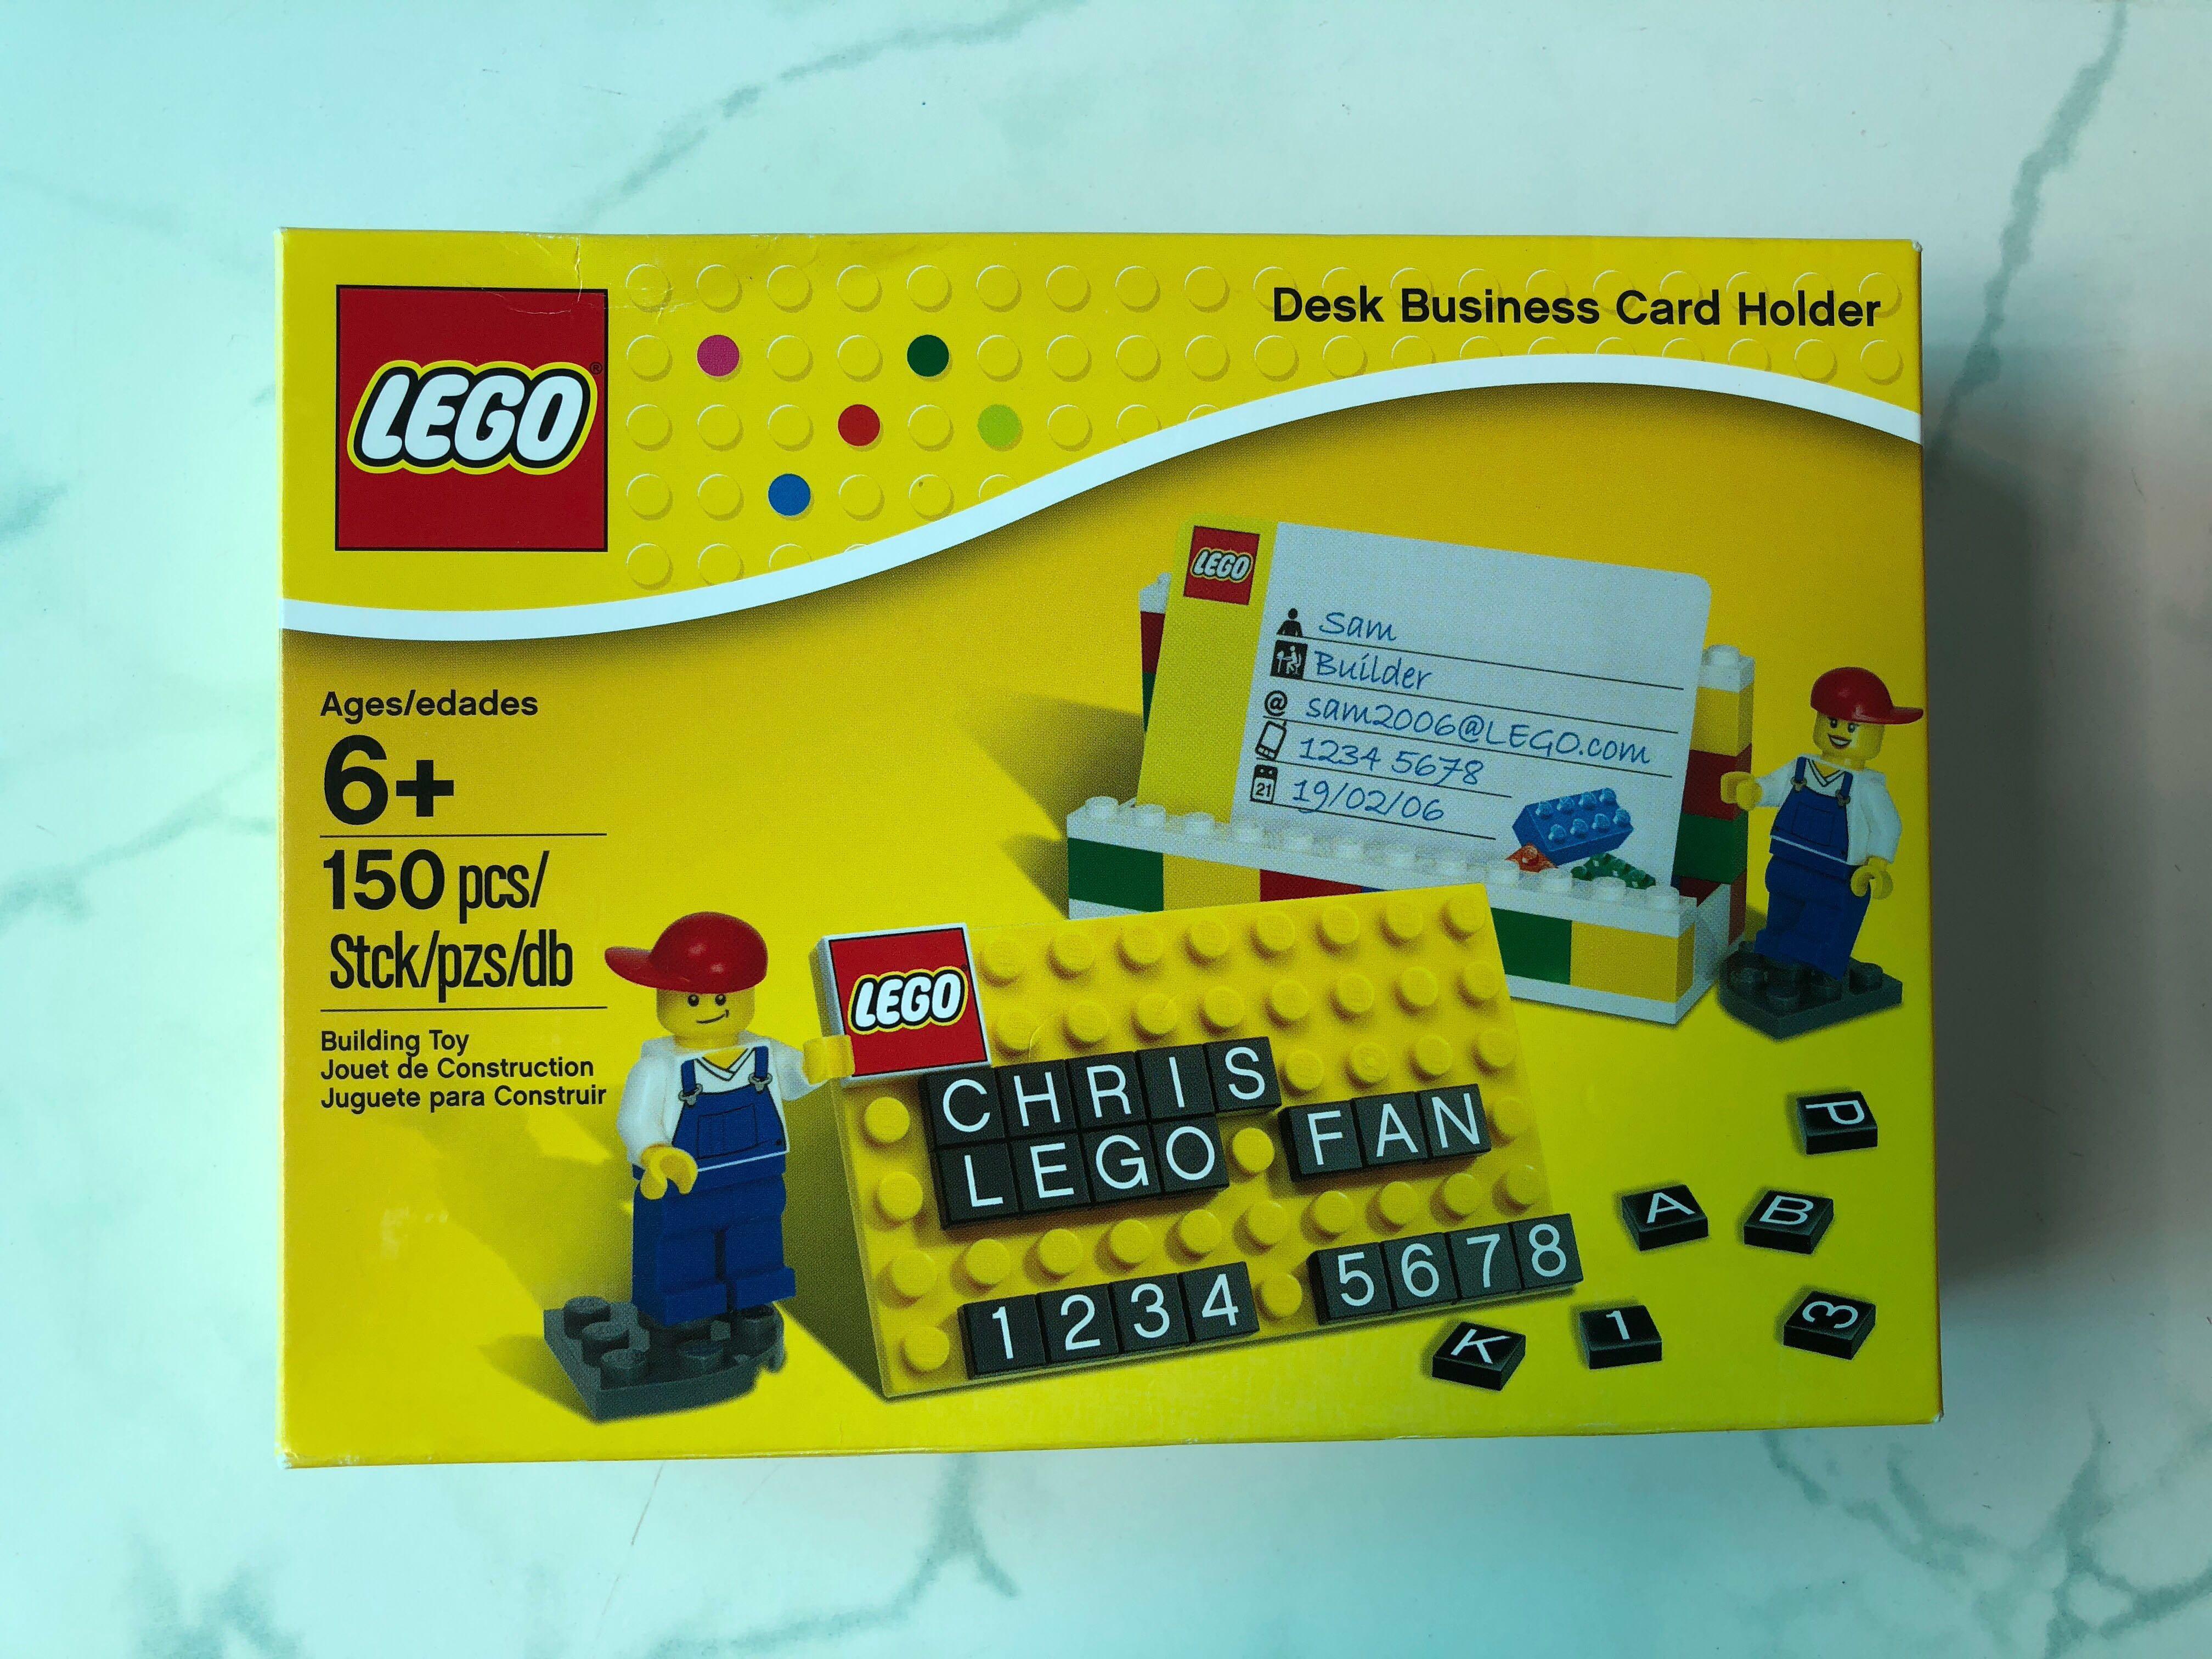 LEGO desk business card holder (used but complete set), Everything ...